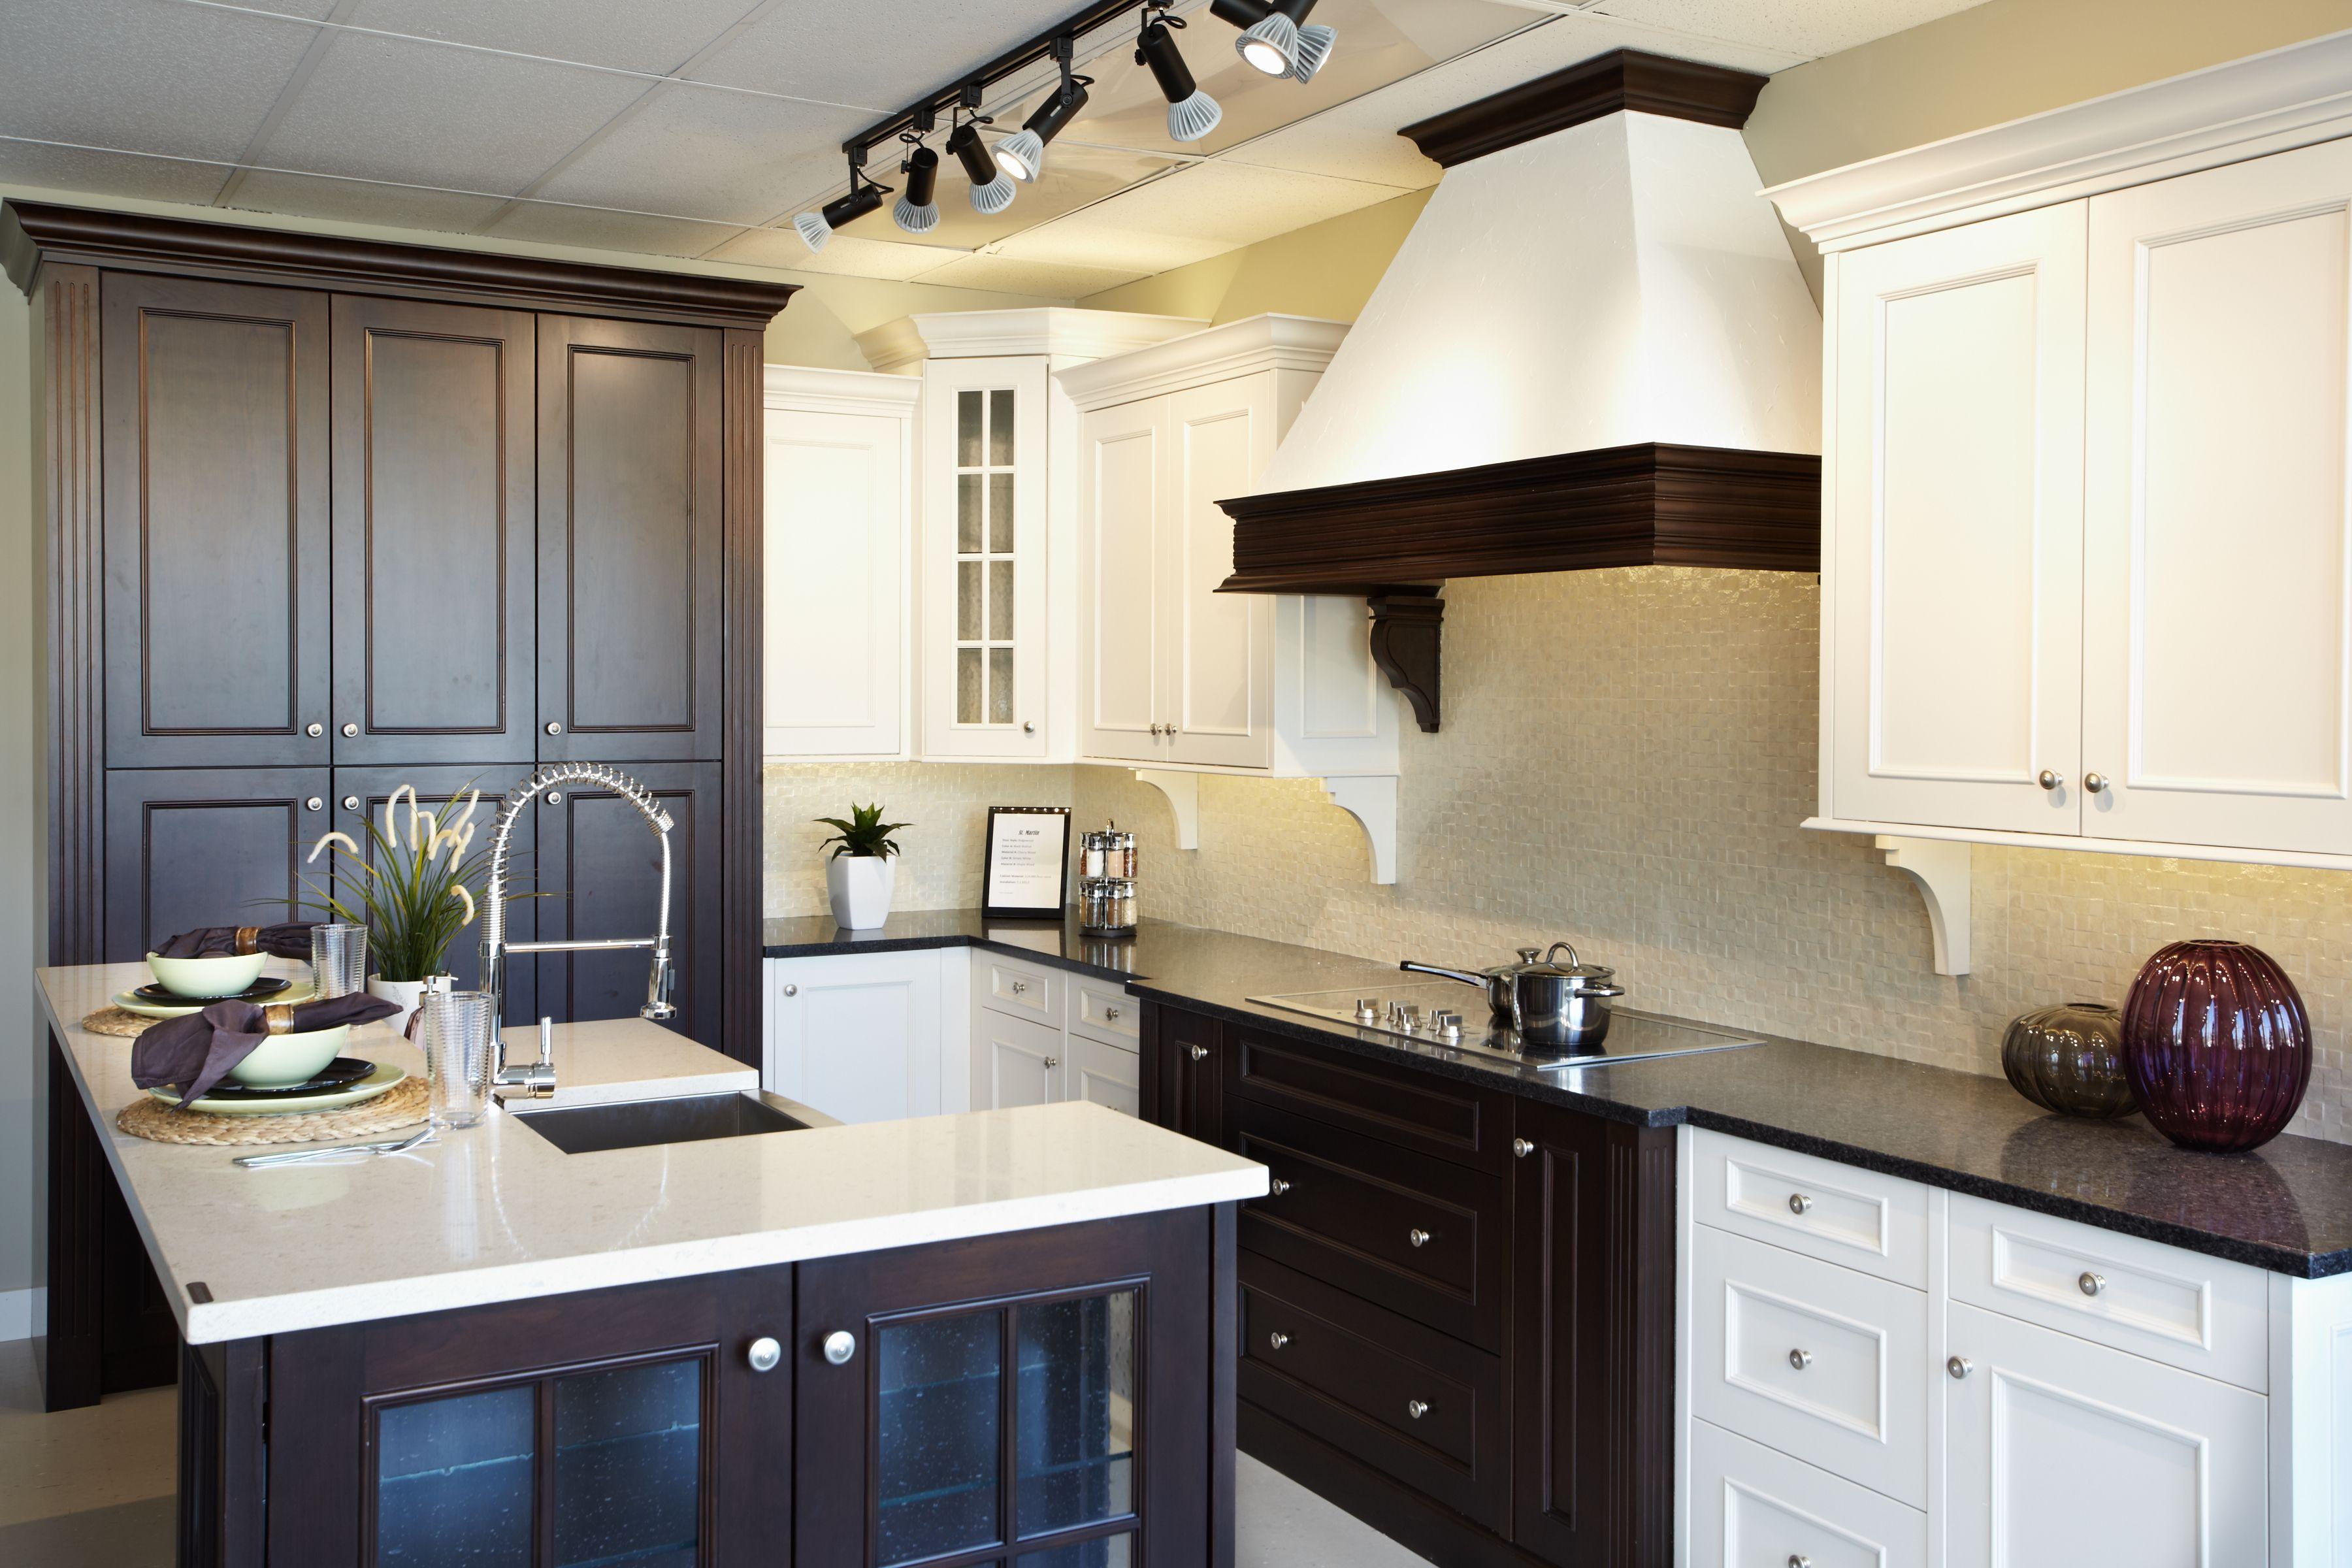 Mama's Kitchen Cabinet in Vancouver, BC | Mama's Kitchen Showroom ...